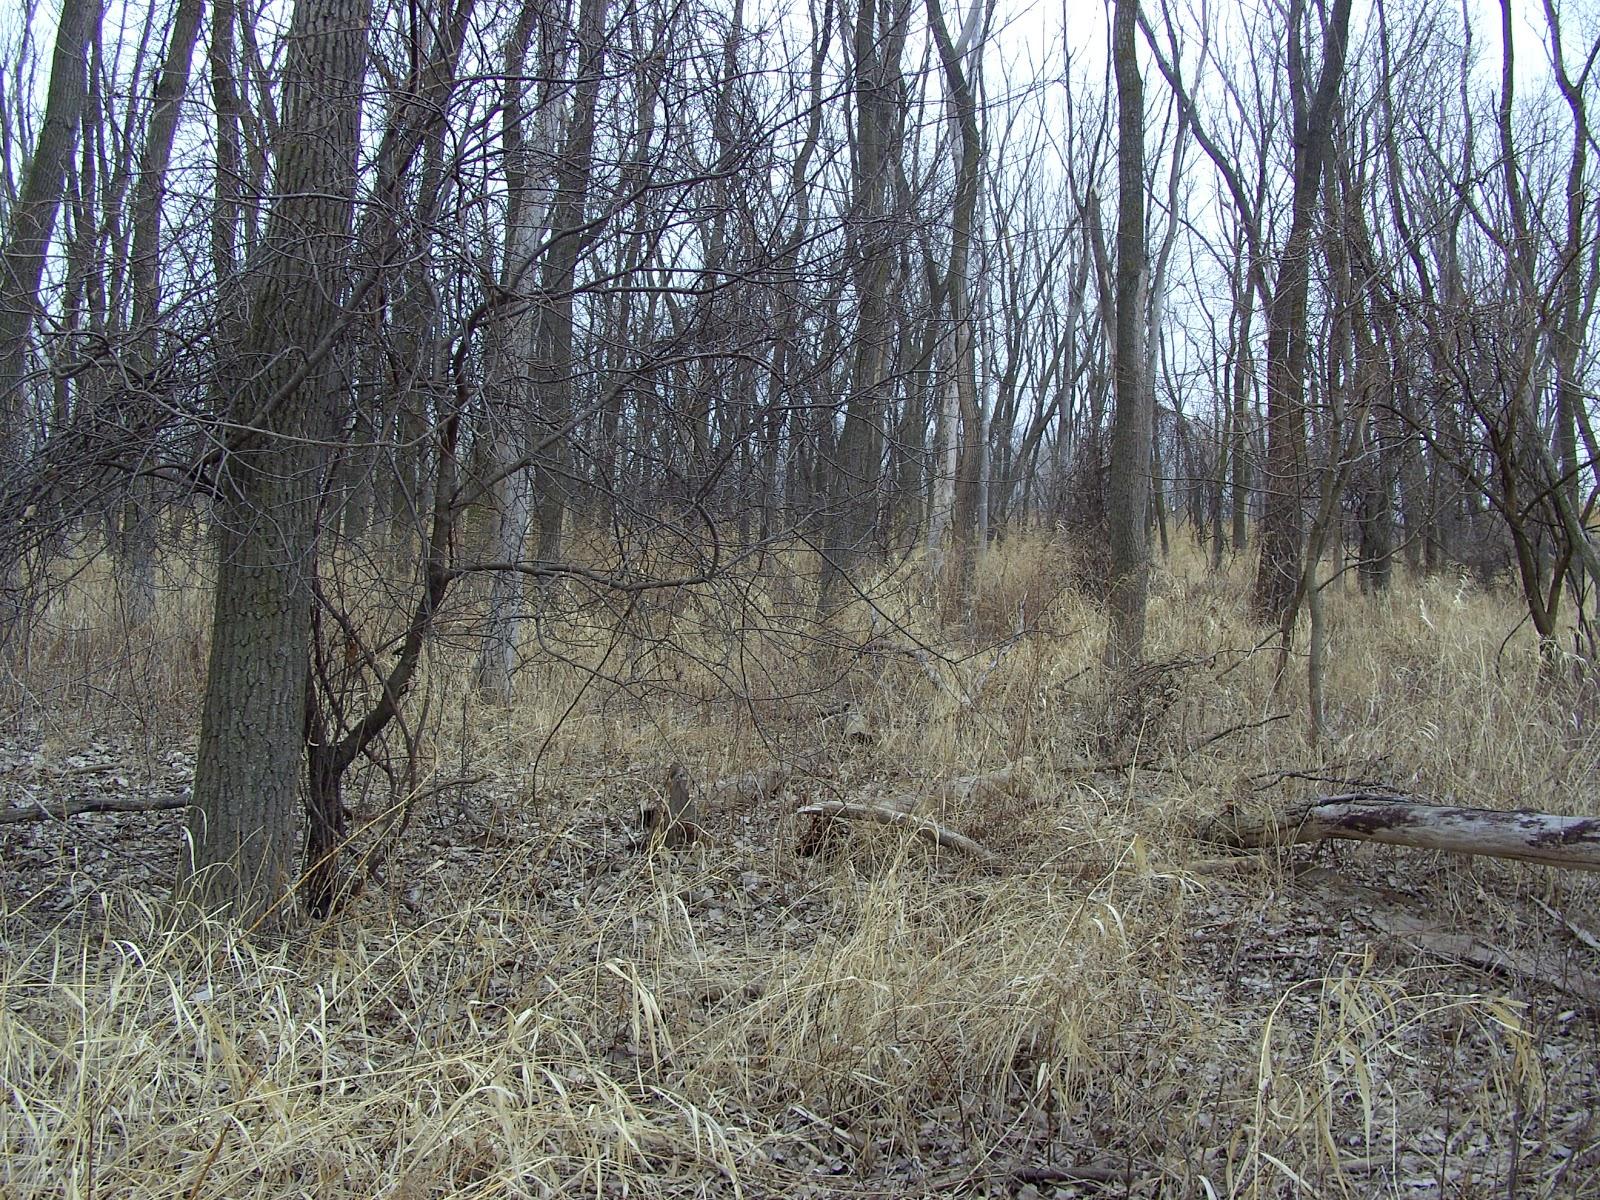 http://1.bp.blogspot.com/-vEIjLvGYhI0/TZEkpXyq0EI/AAAAAAAAAEE/QdQqFxmNMtg/s1600/wooded+area.jpg